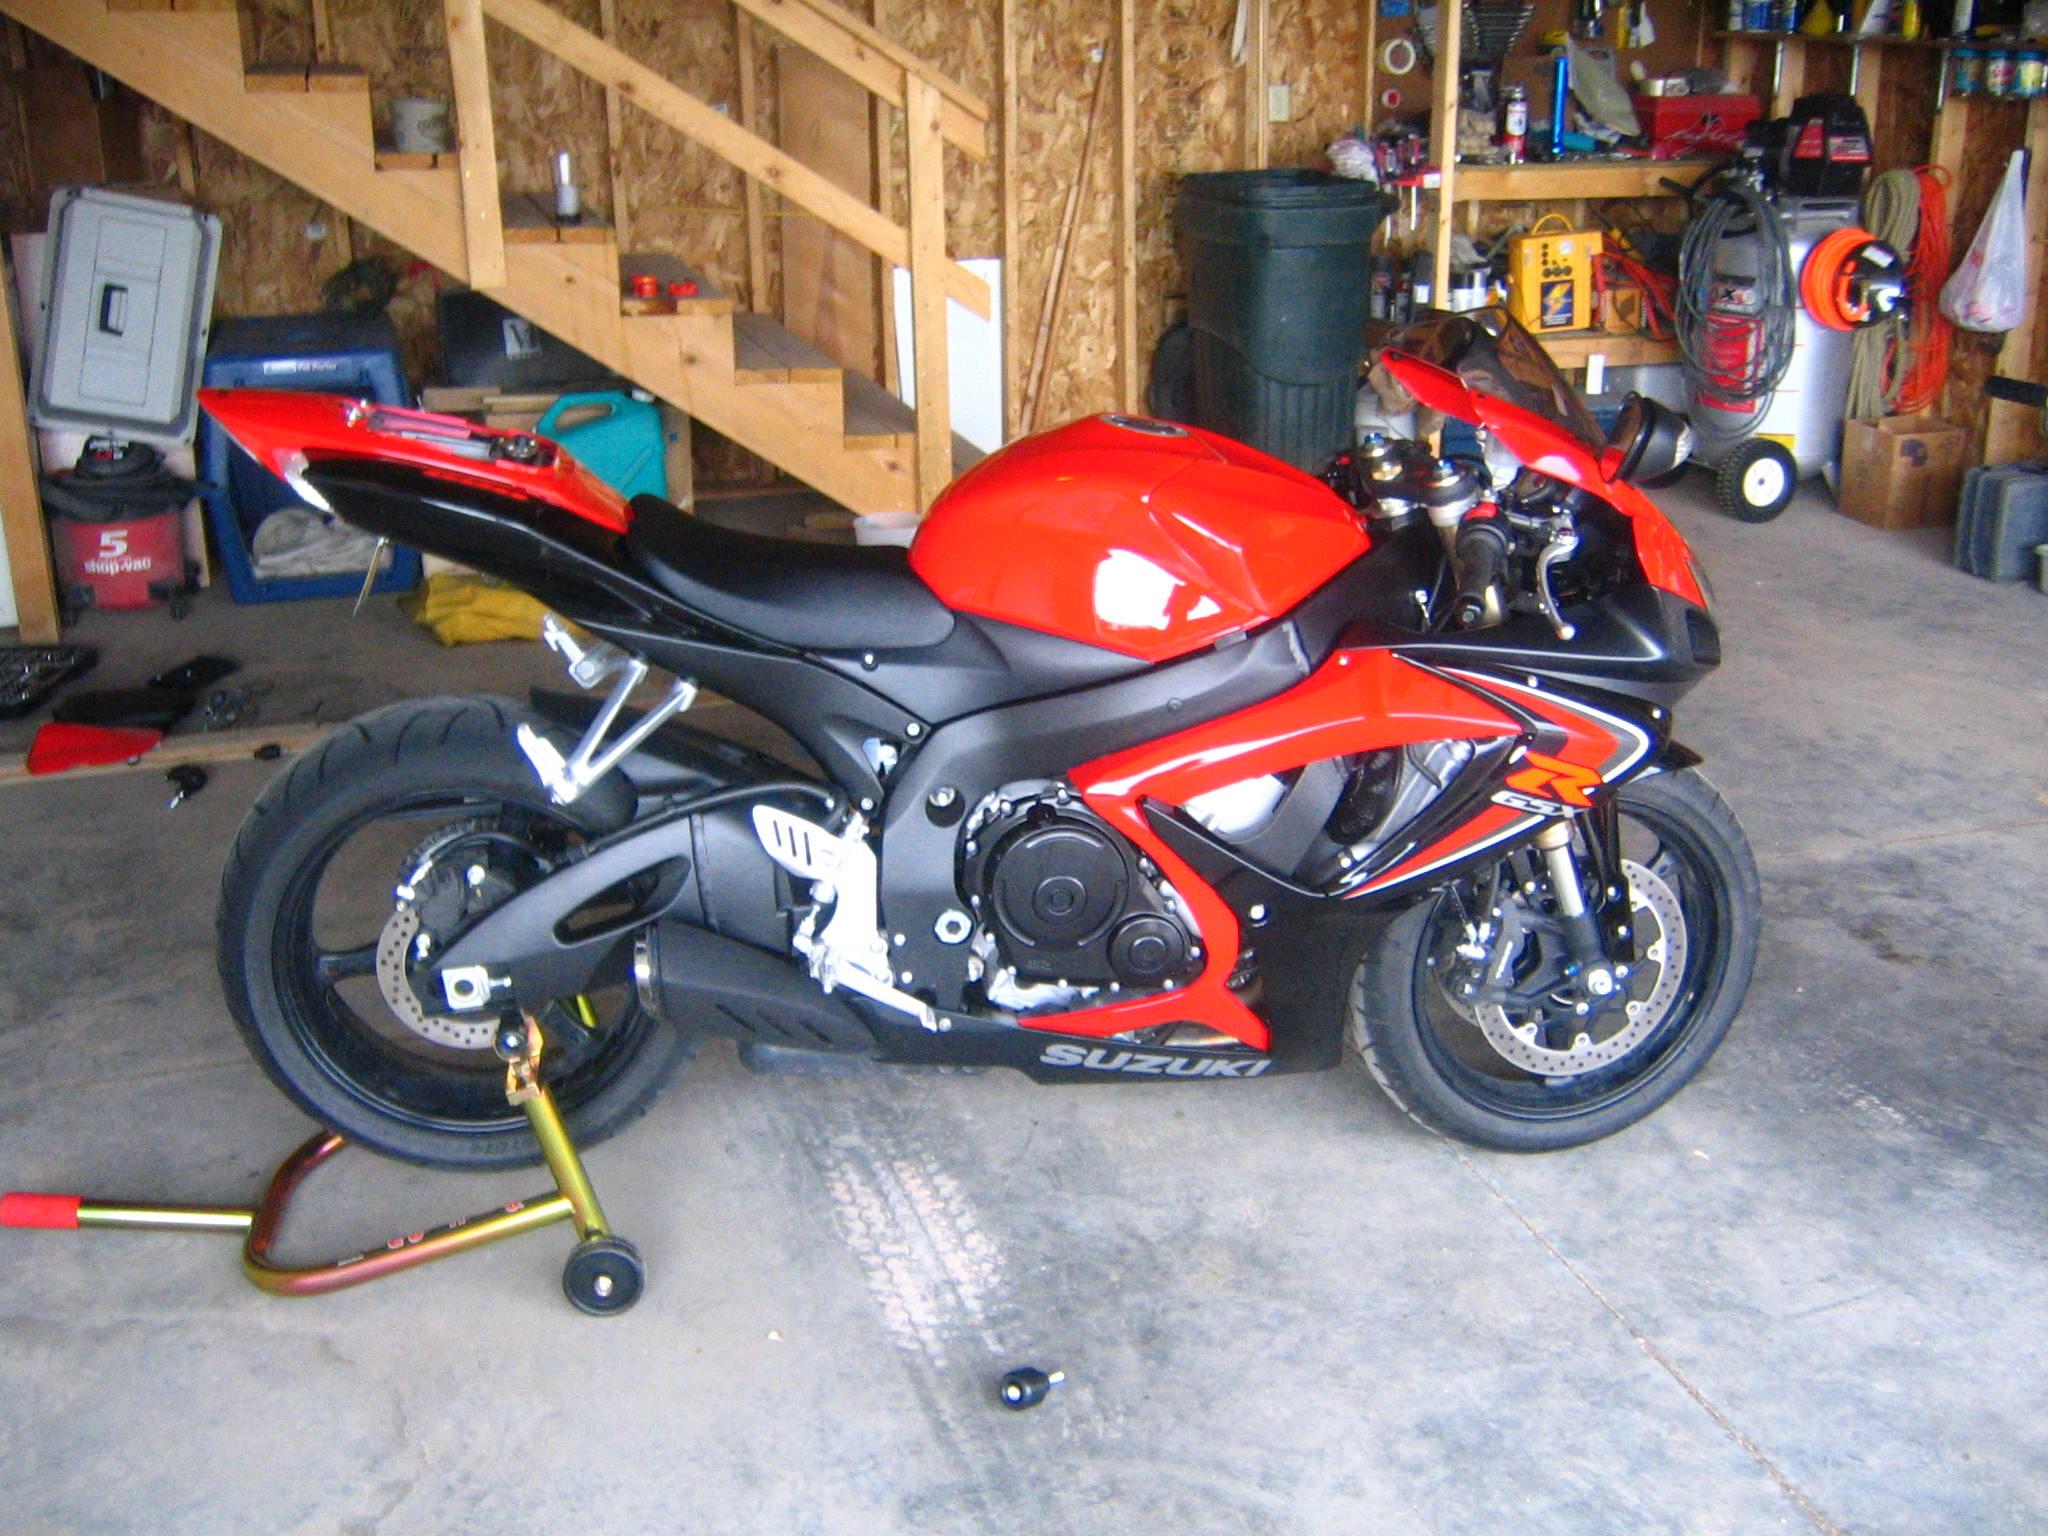 how to: install frame sliders - Sportbikes.net